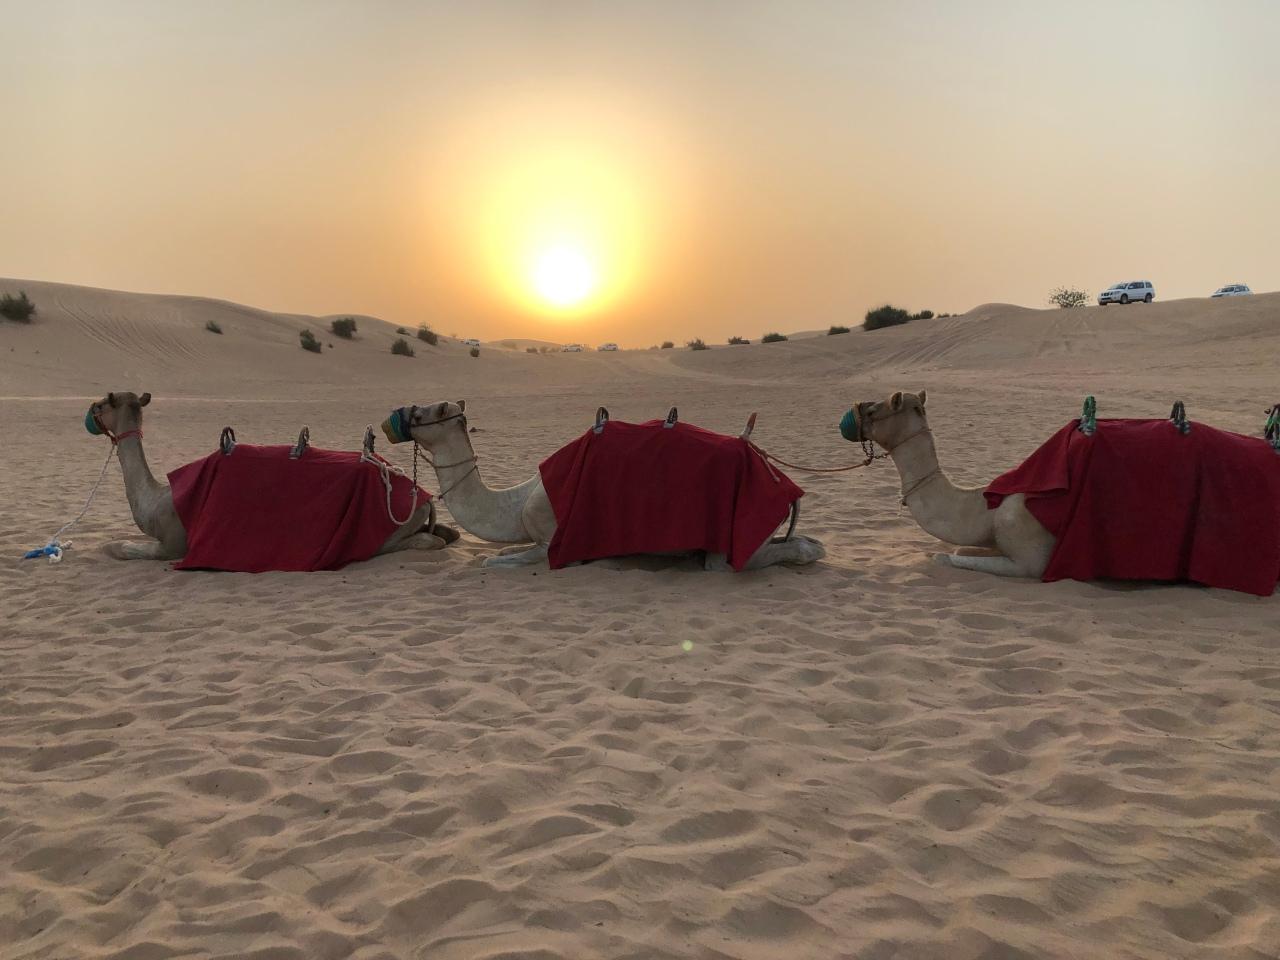 Camels at sunset in the Dubai desert